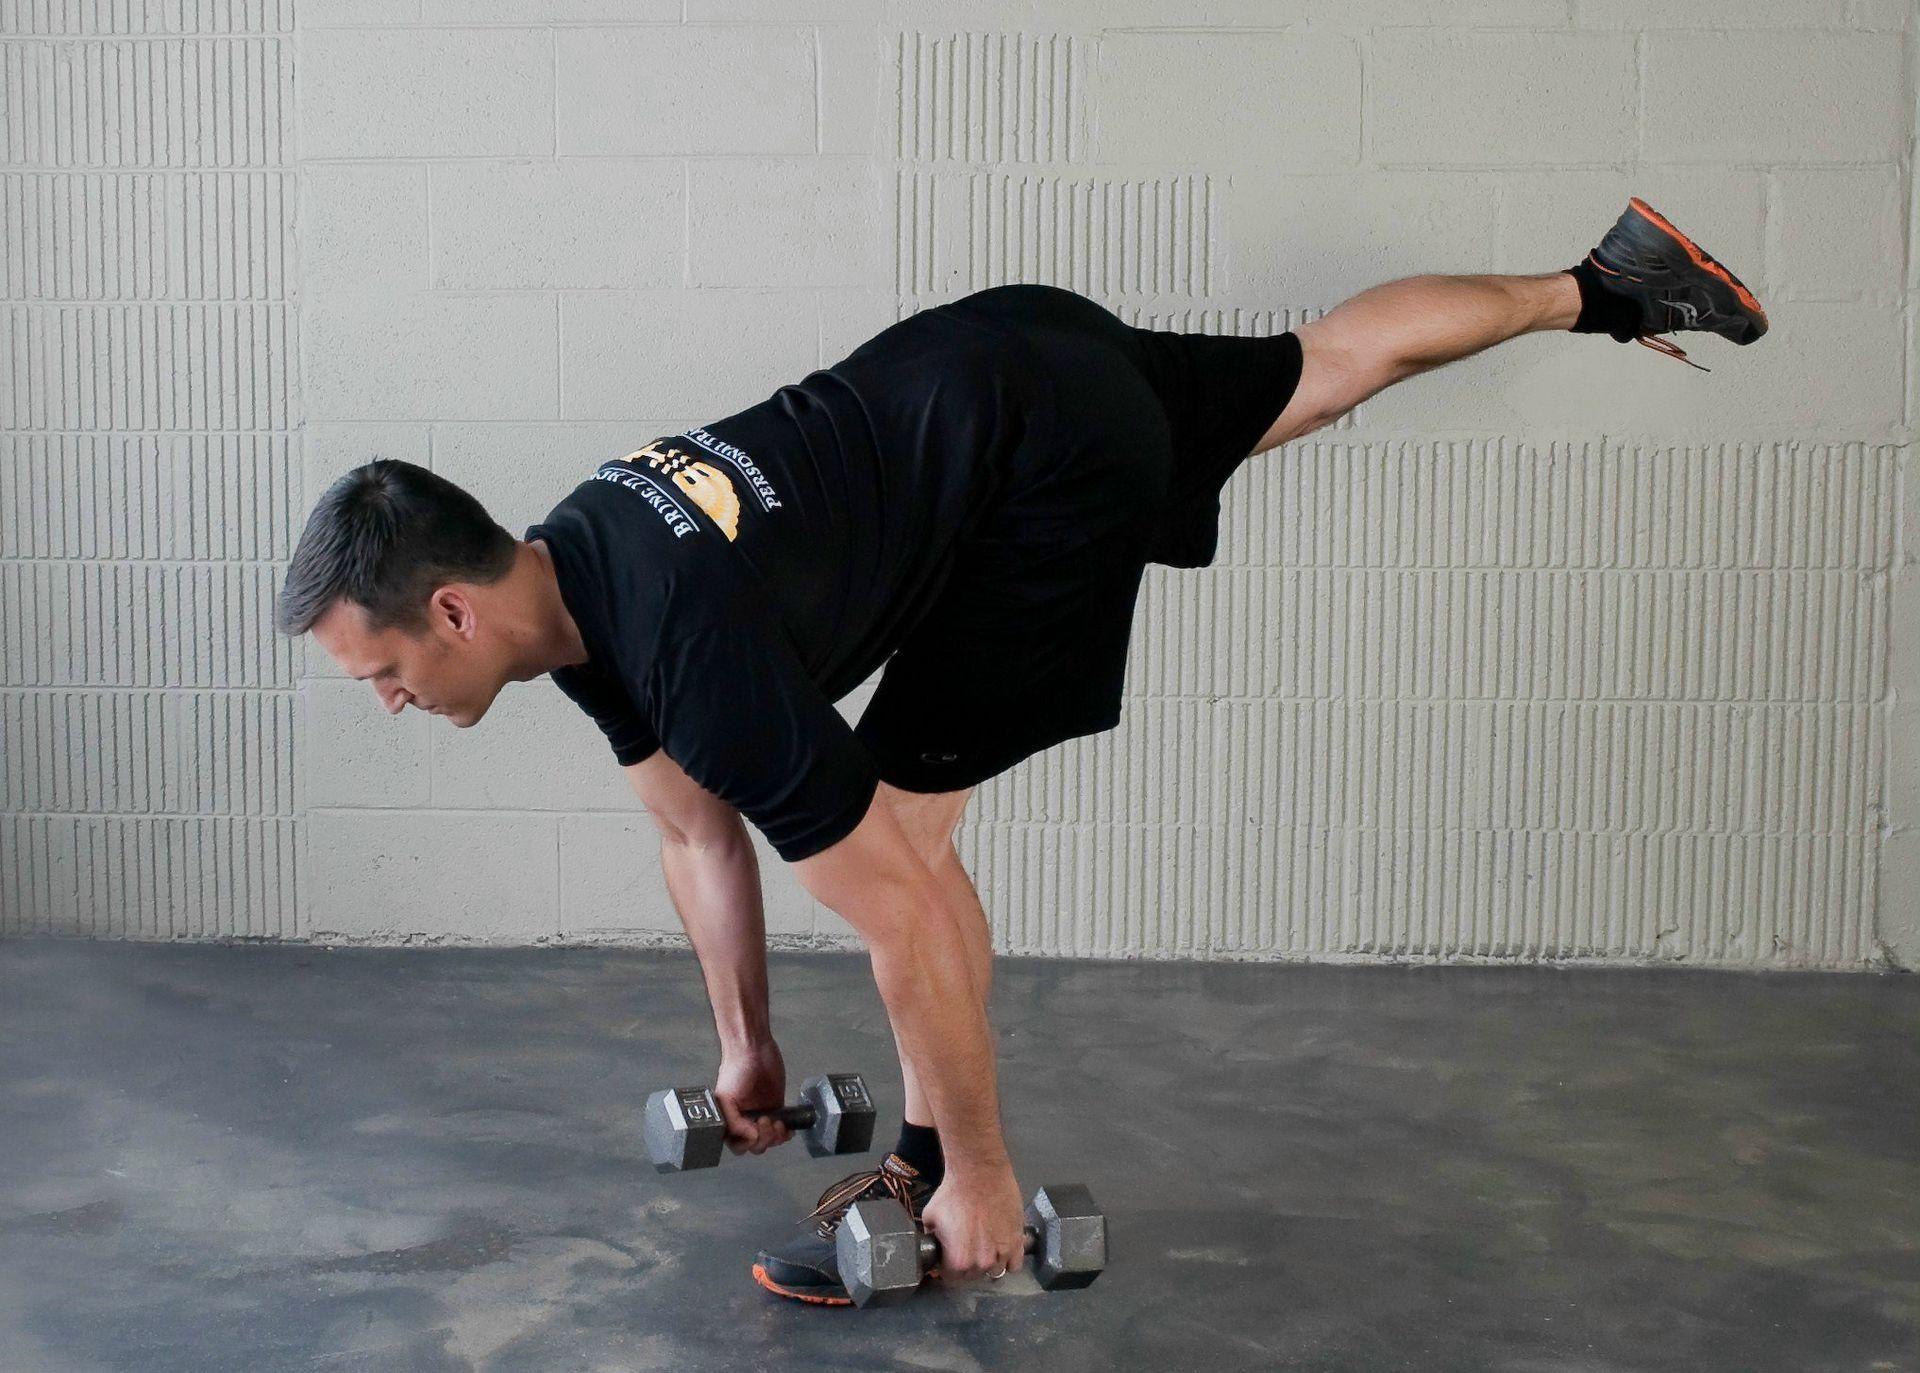 dsc_1945-edit1-fitness